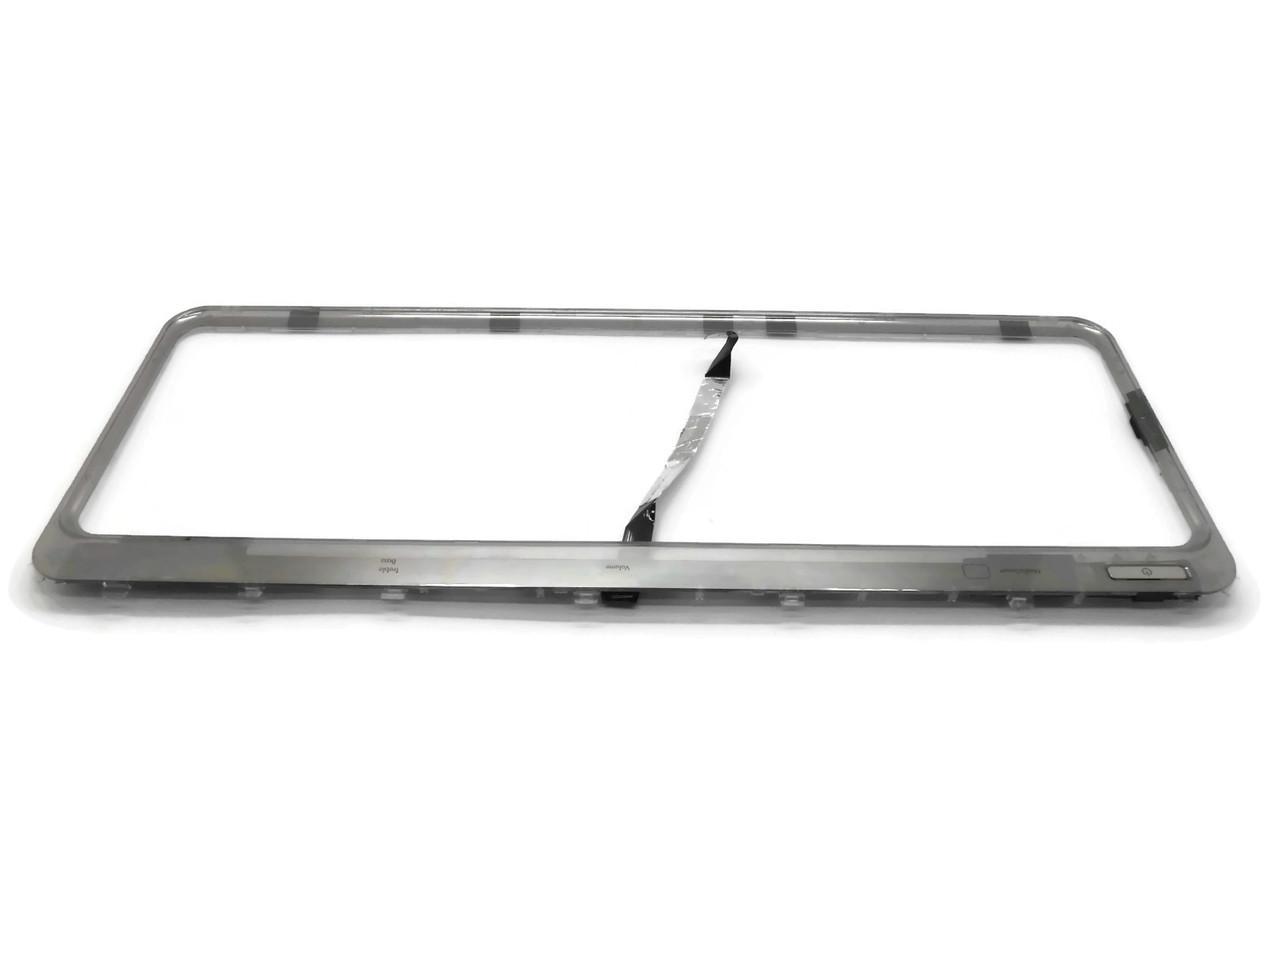 HP HDX X18-1027CL Premium Notebook Drivers (2019)